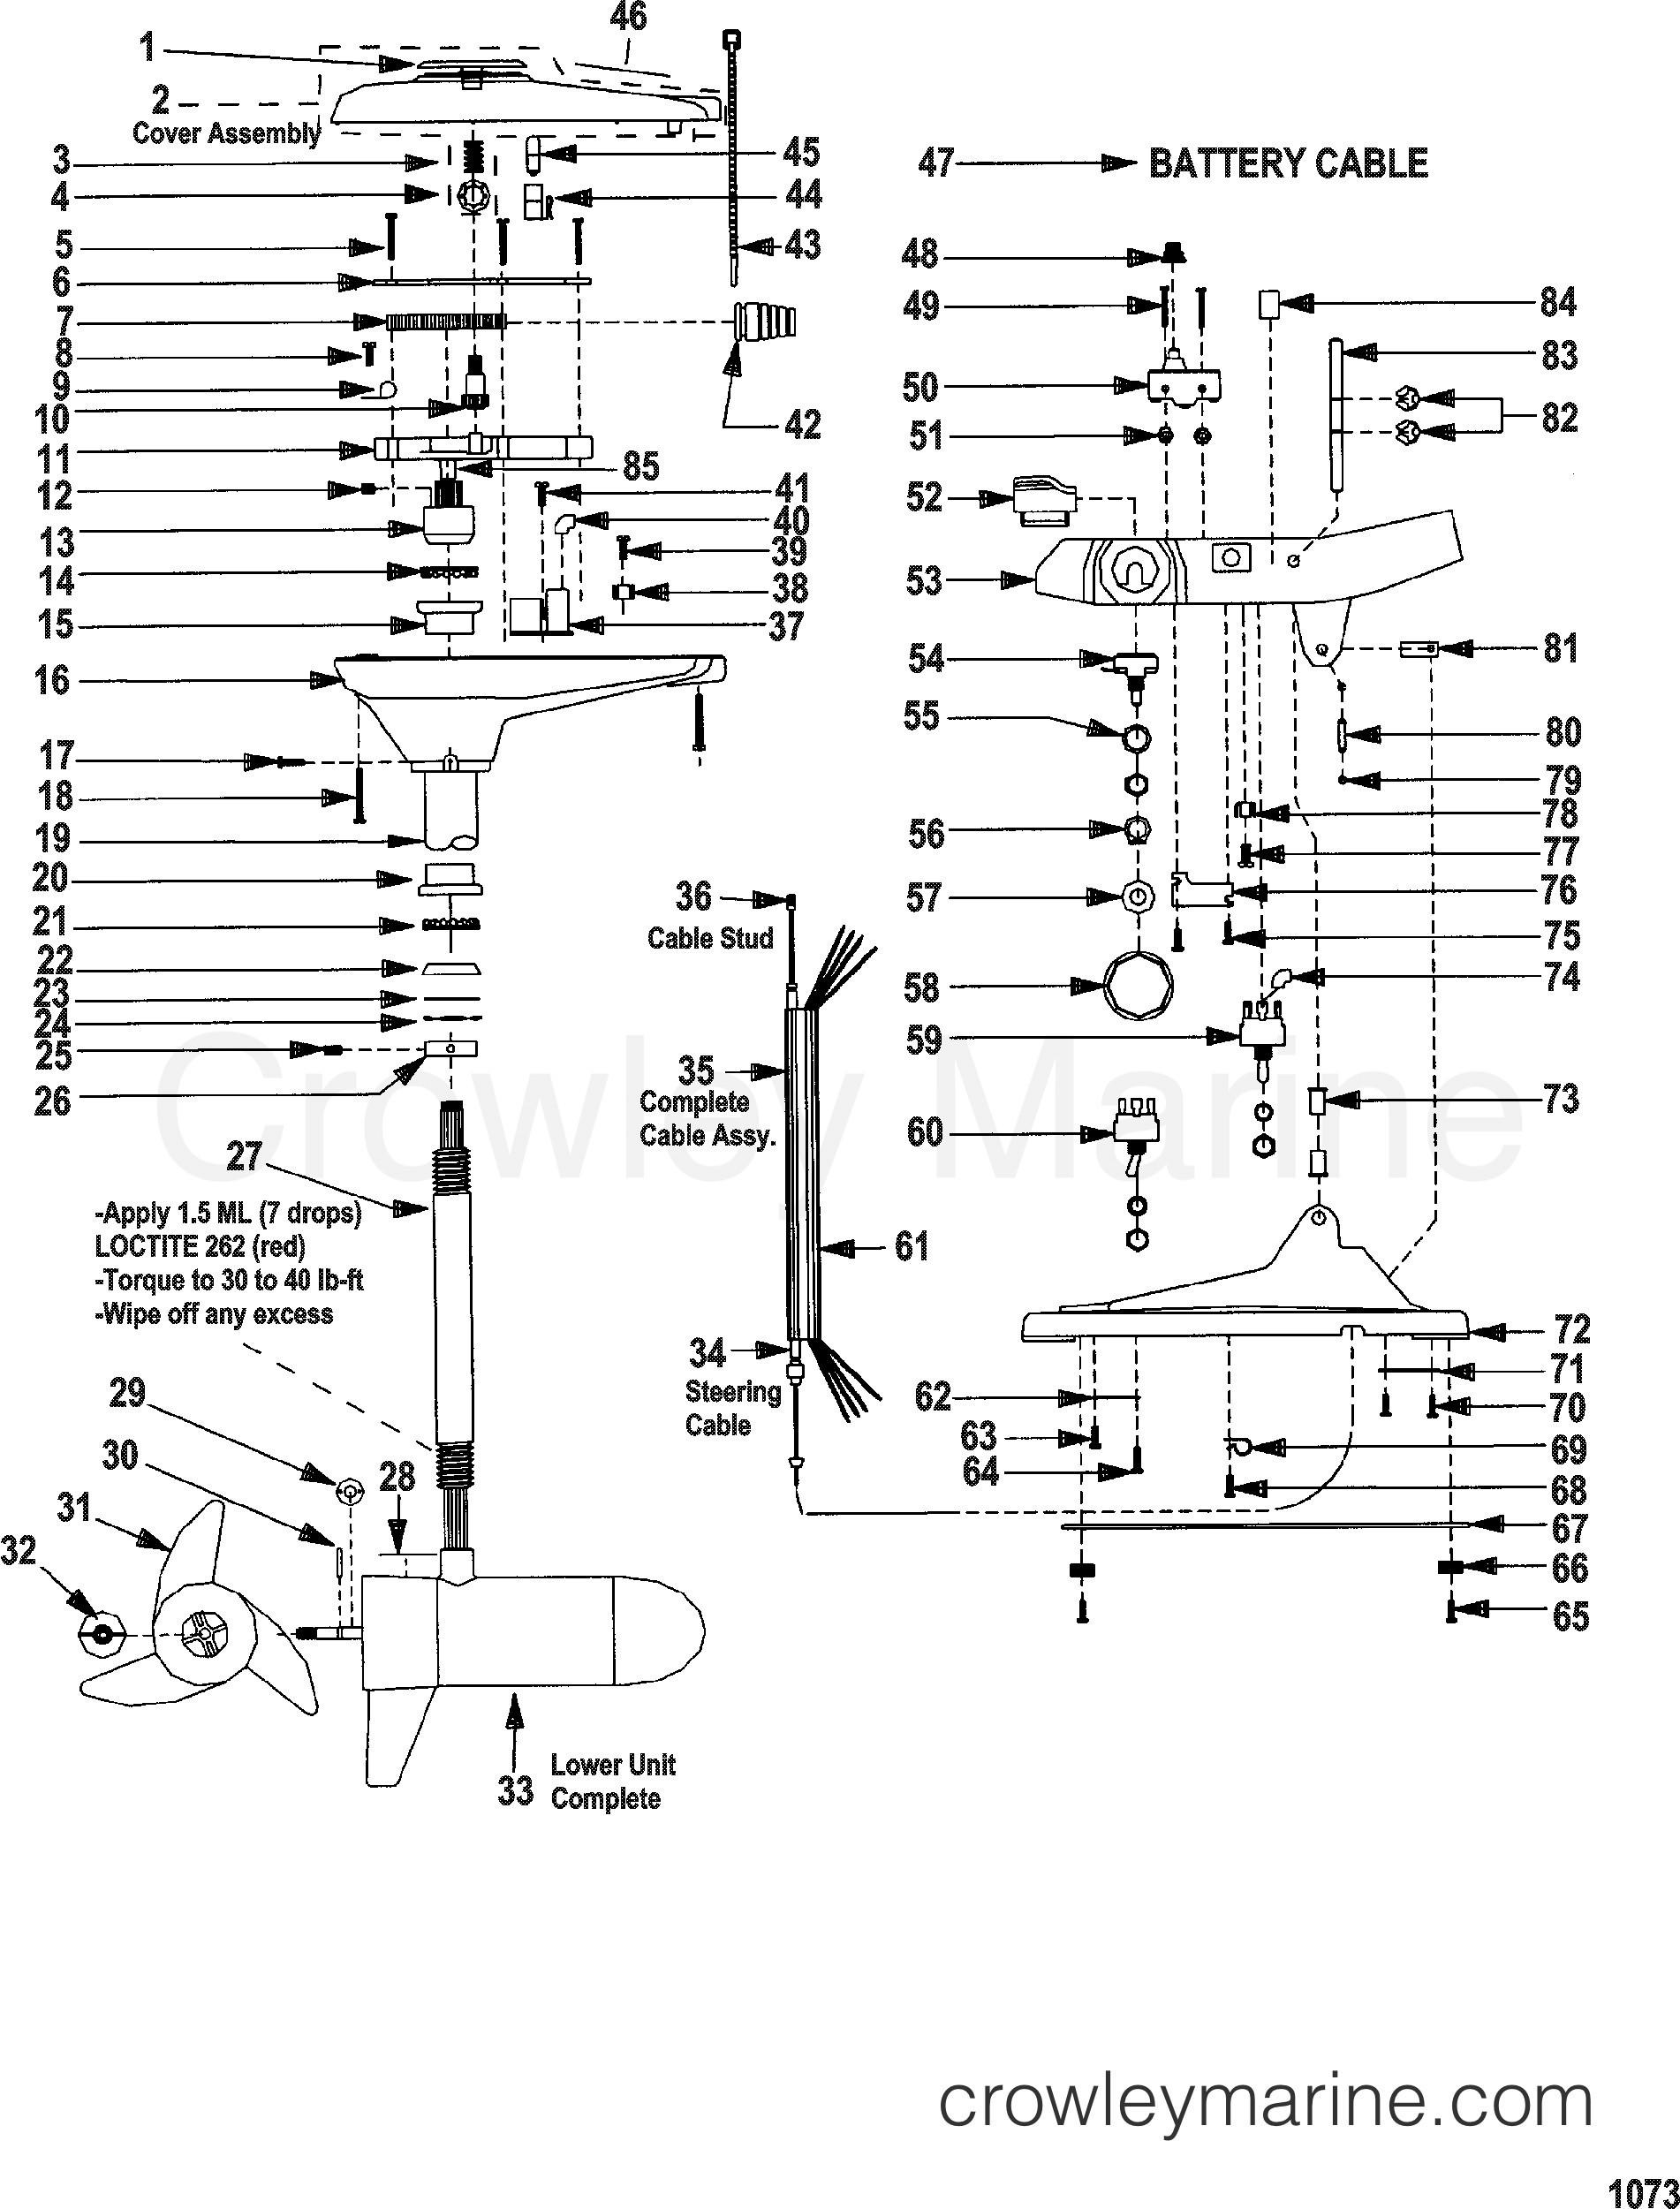 Radiator System Diagram Wiring Diagram Fo Wiring Diagram for Dummies Wiring Diagrams Of Radiator System Diagram